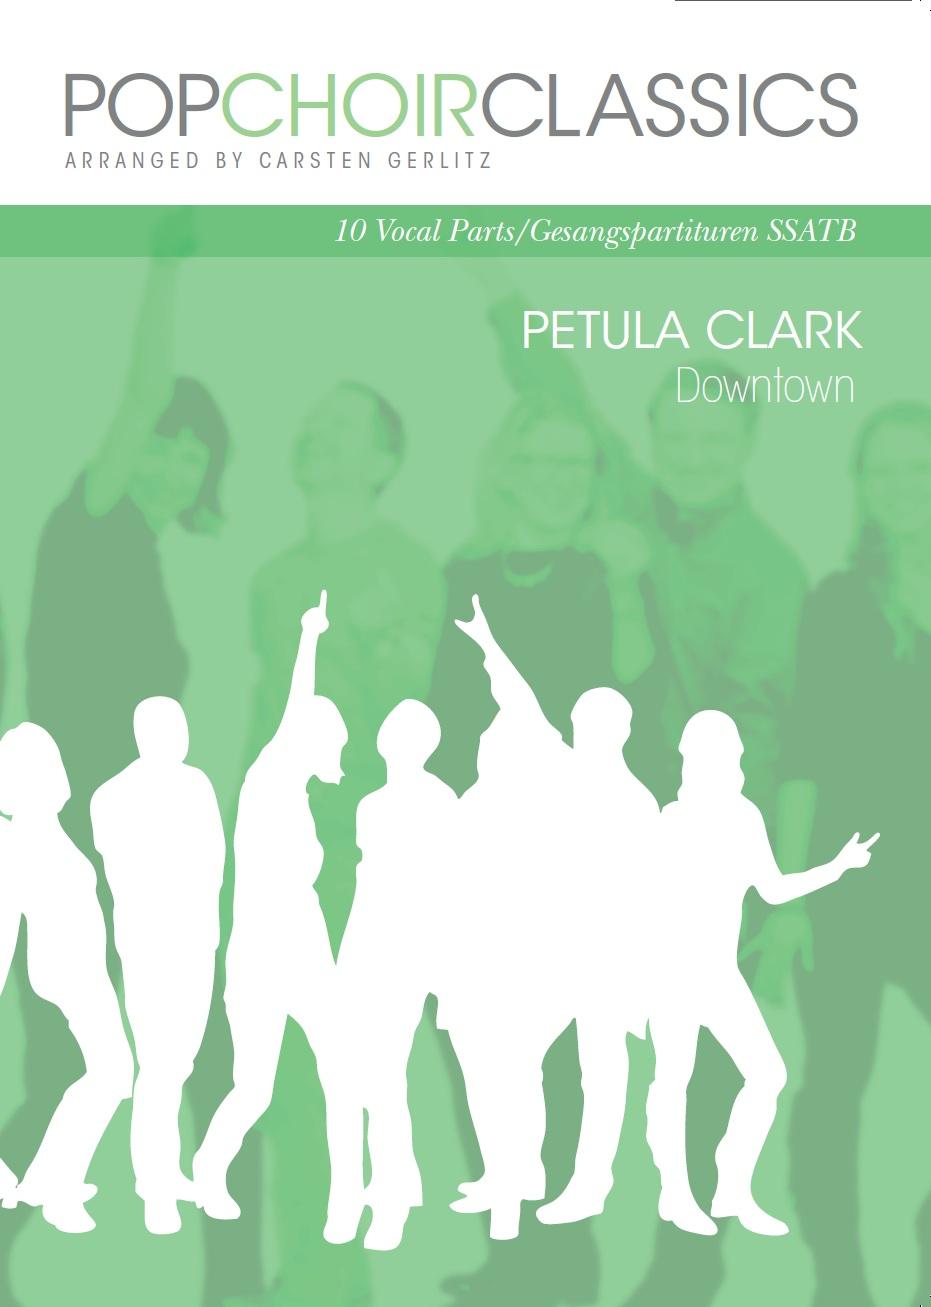 POPCHOIRCLASSICS Petula Clark - Downtown Carsten Gerlitz